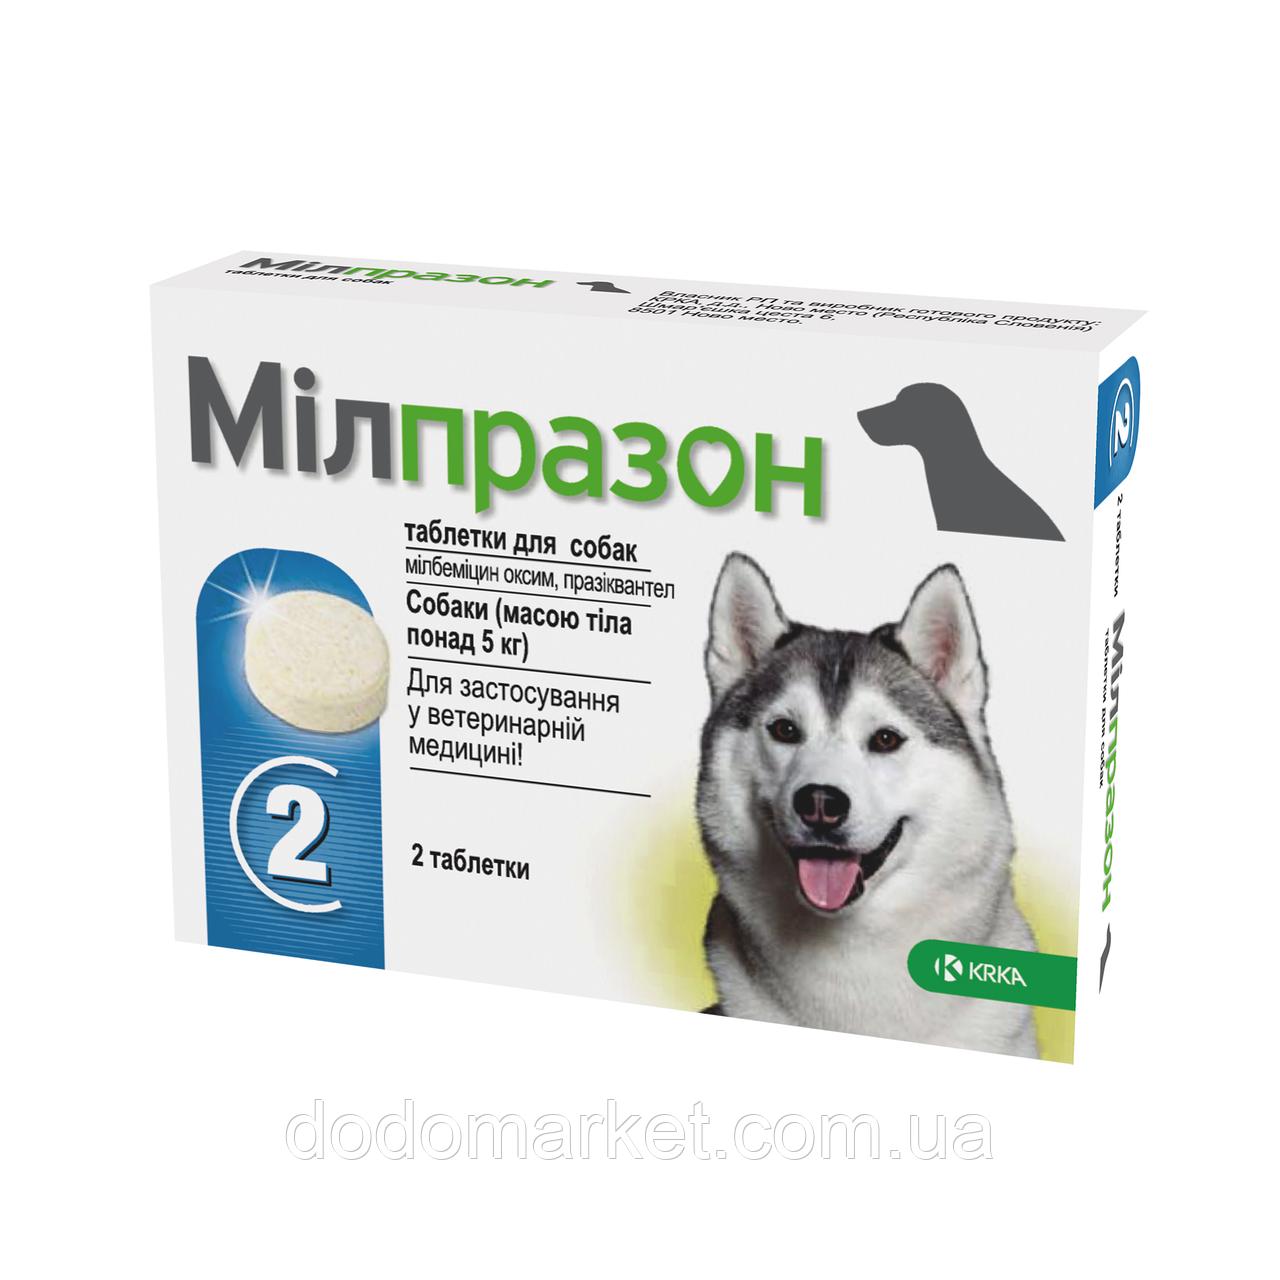 Милпразон антигельминтик для собак более 5 кг (2 таблетки 12,5 мг/125 мг)